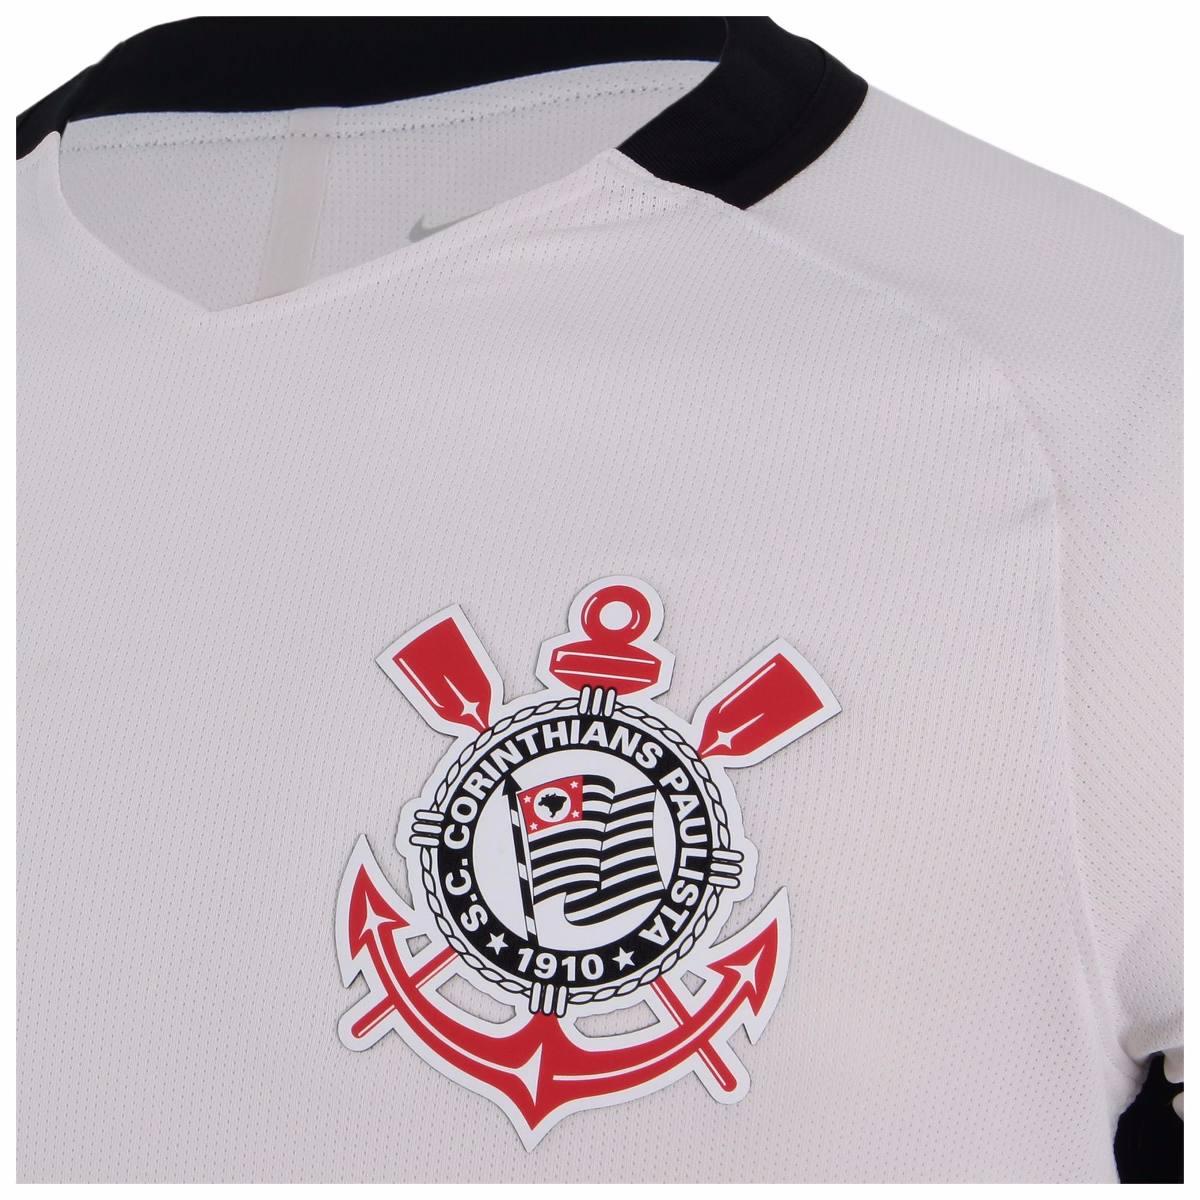 25e3d6c479dd7a  camisa corinthians jogador 2016 branca oficial nike -  netfut. Carregando zoom. ae4c1bbe5682e